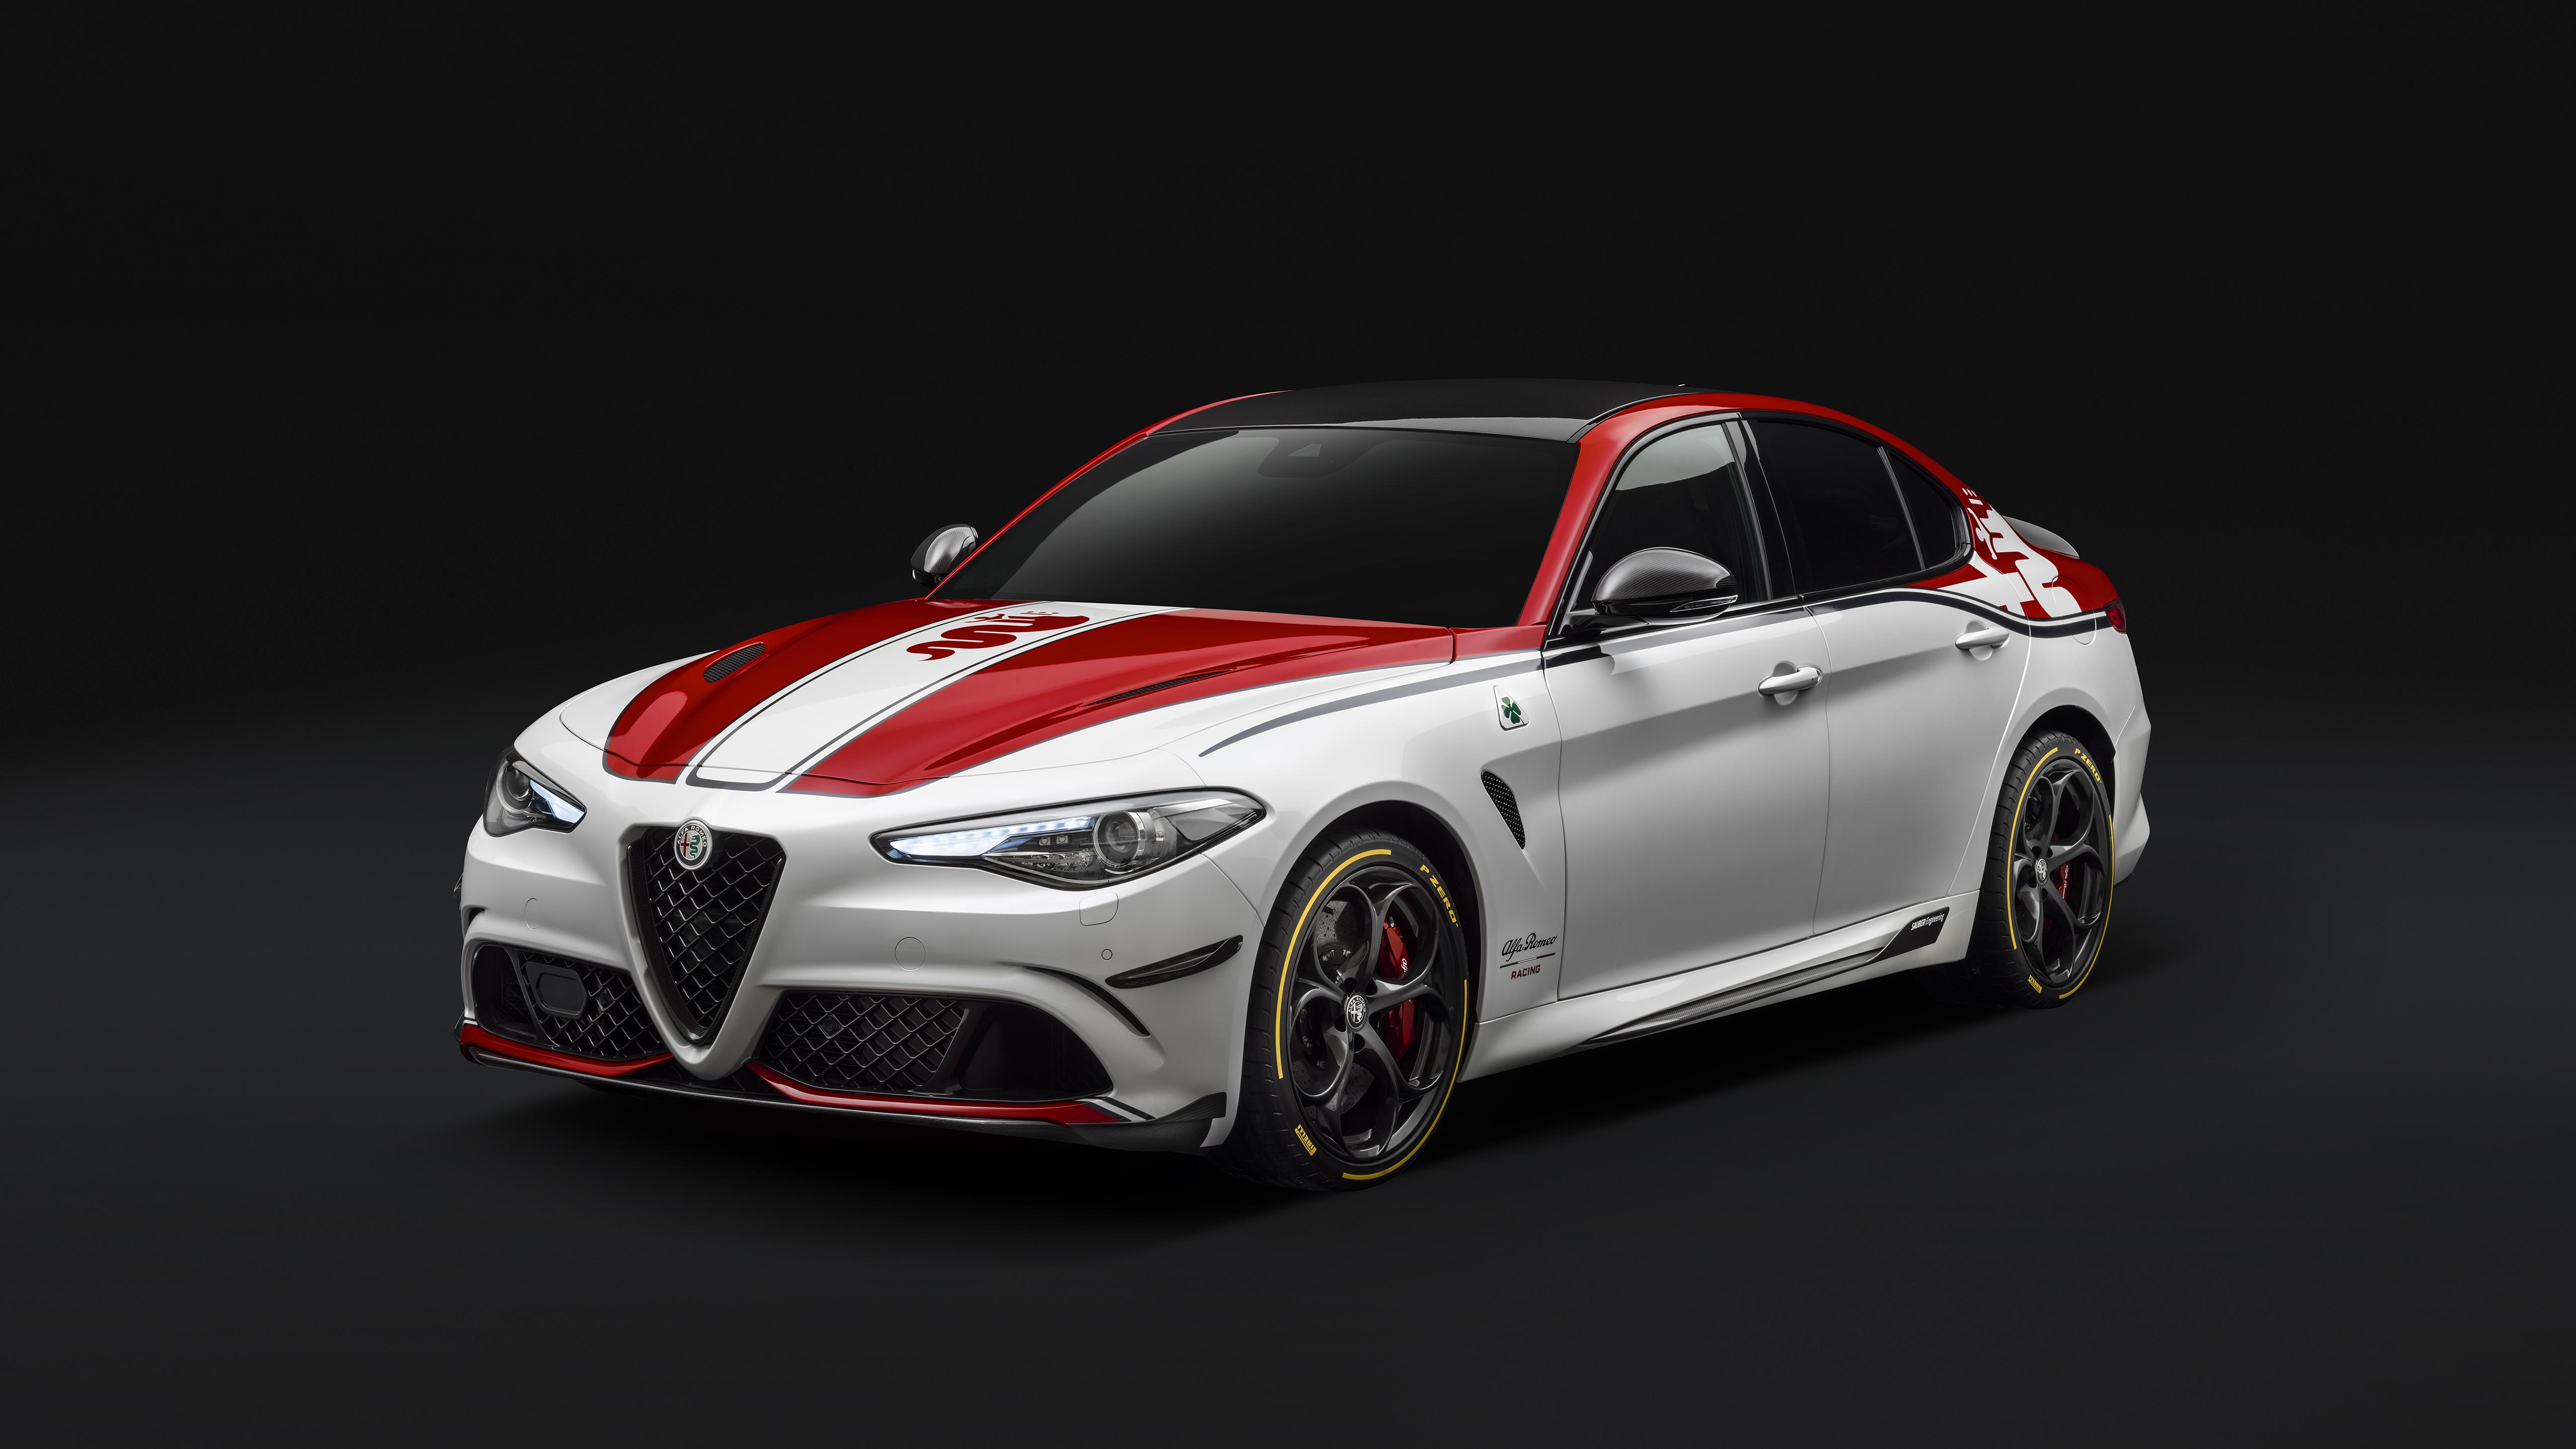 Alfa Romeo Giulia Quadrifoglio Alfa Romeo Racing 2019 4k 2